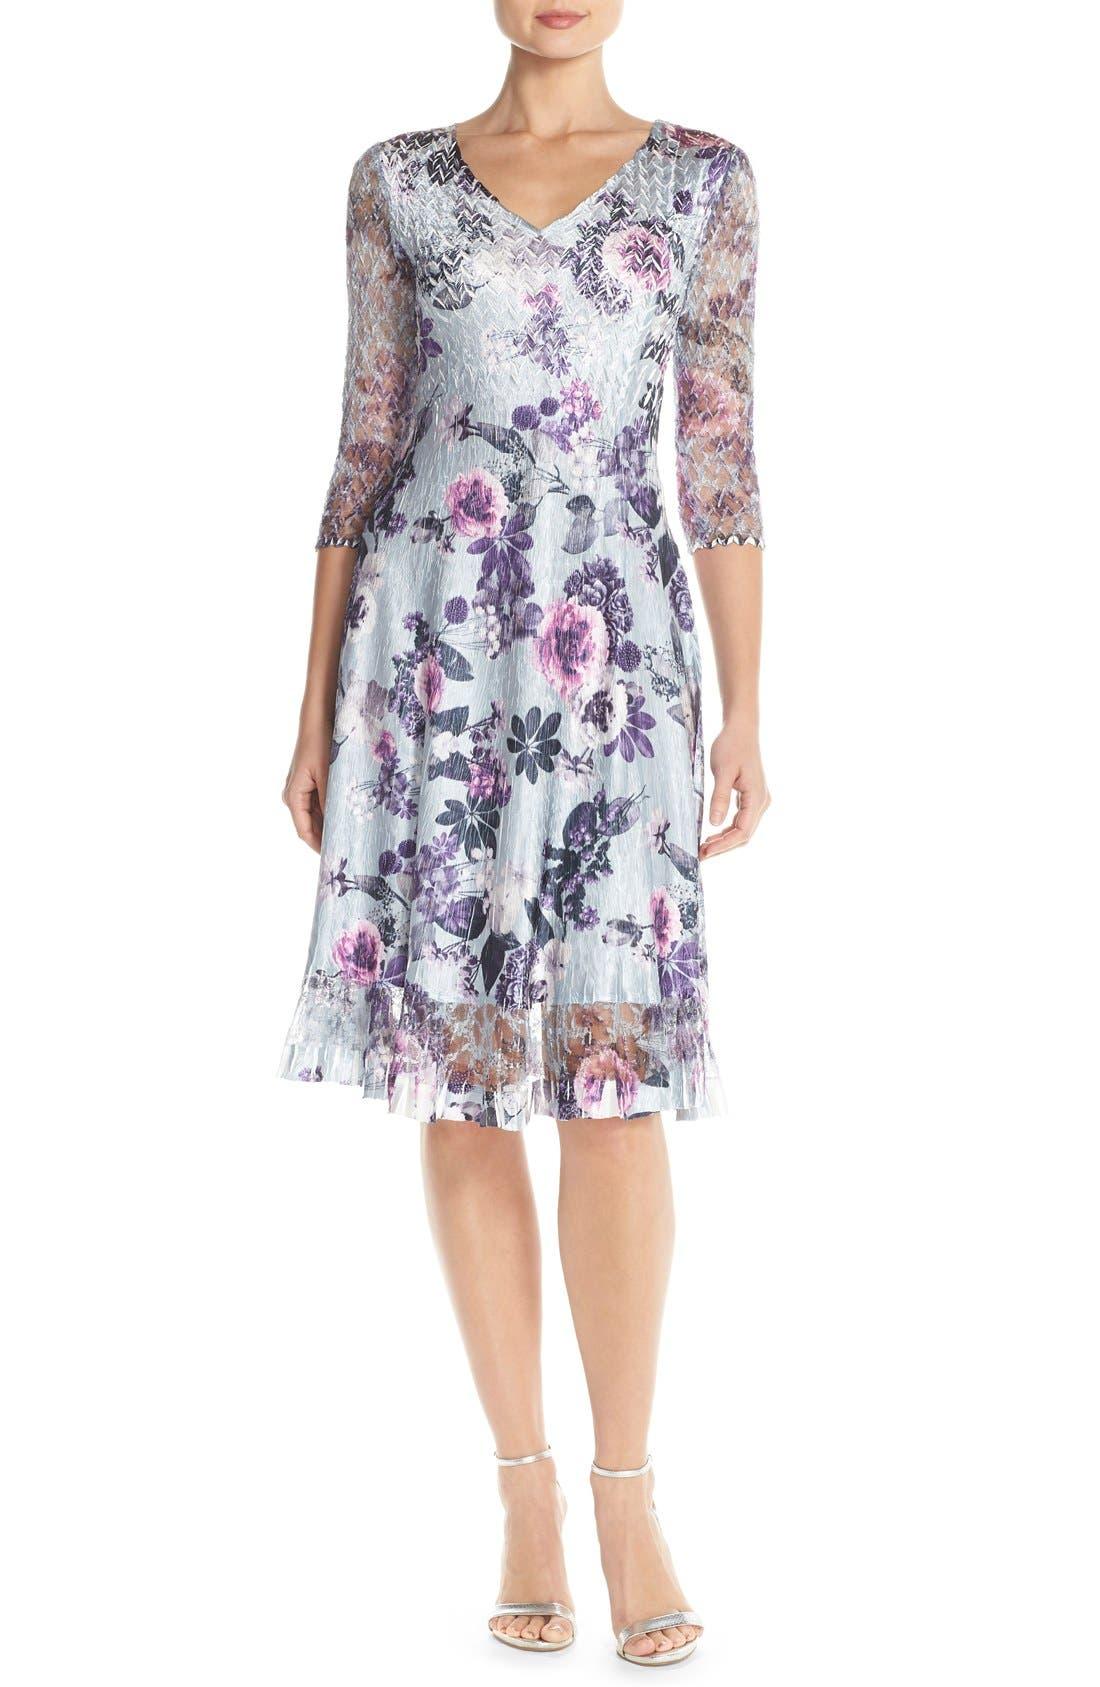 Alternate Image 1 Selected - Komarov Mixed Media A-Line Dress